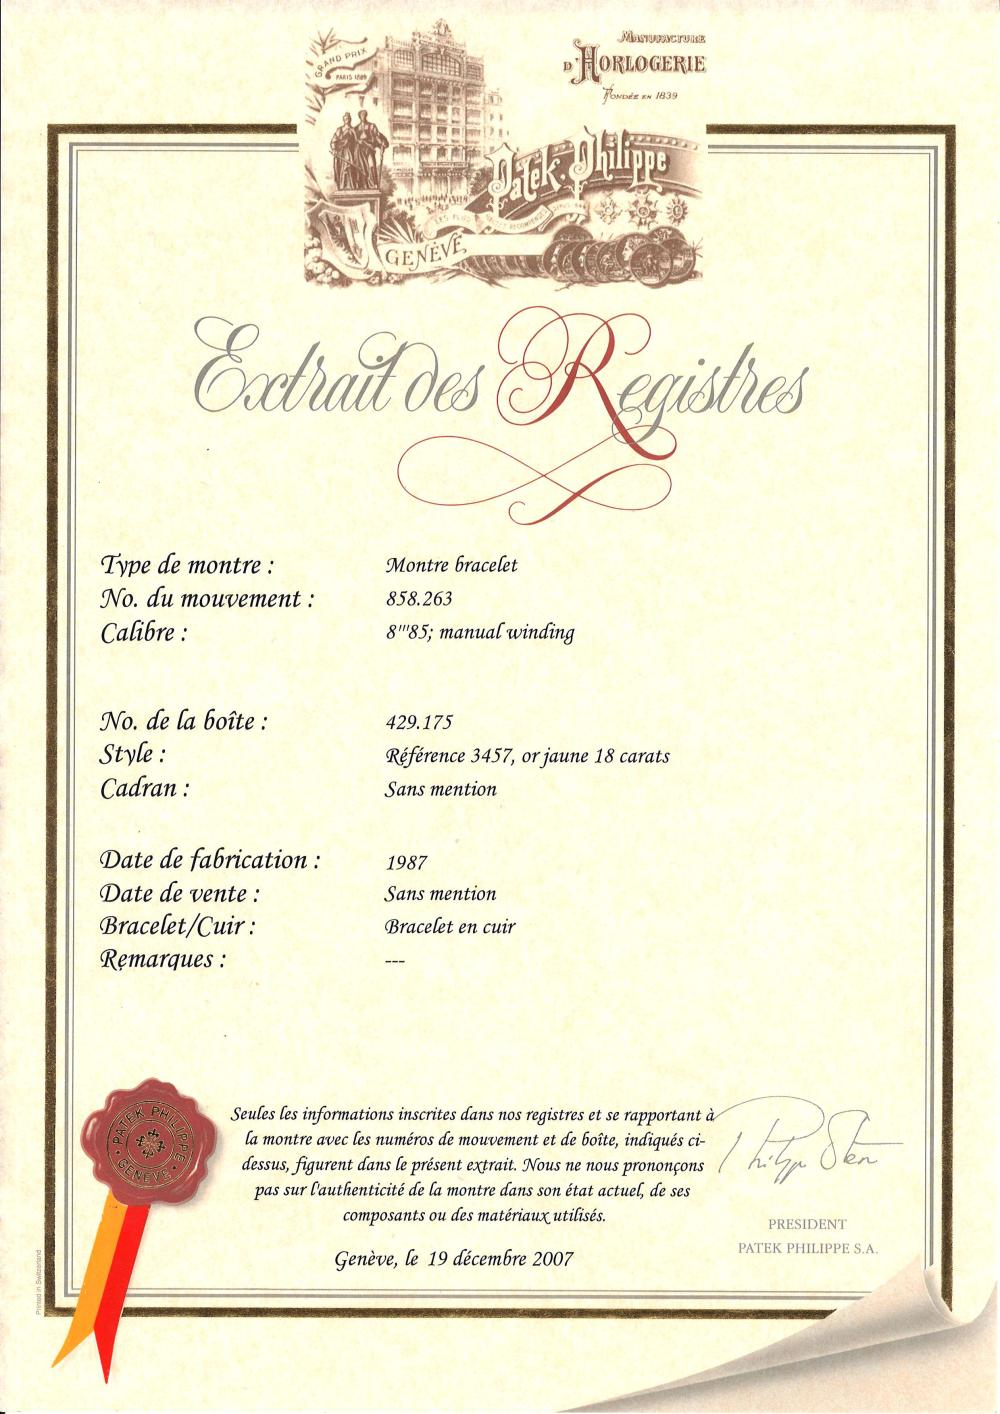 La Boite Jaune Prix o - patek philippe ref. 3457, n° 858263 / 429175